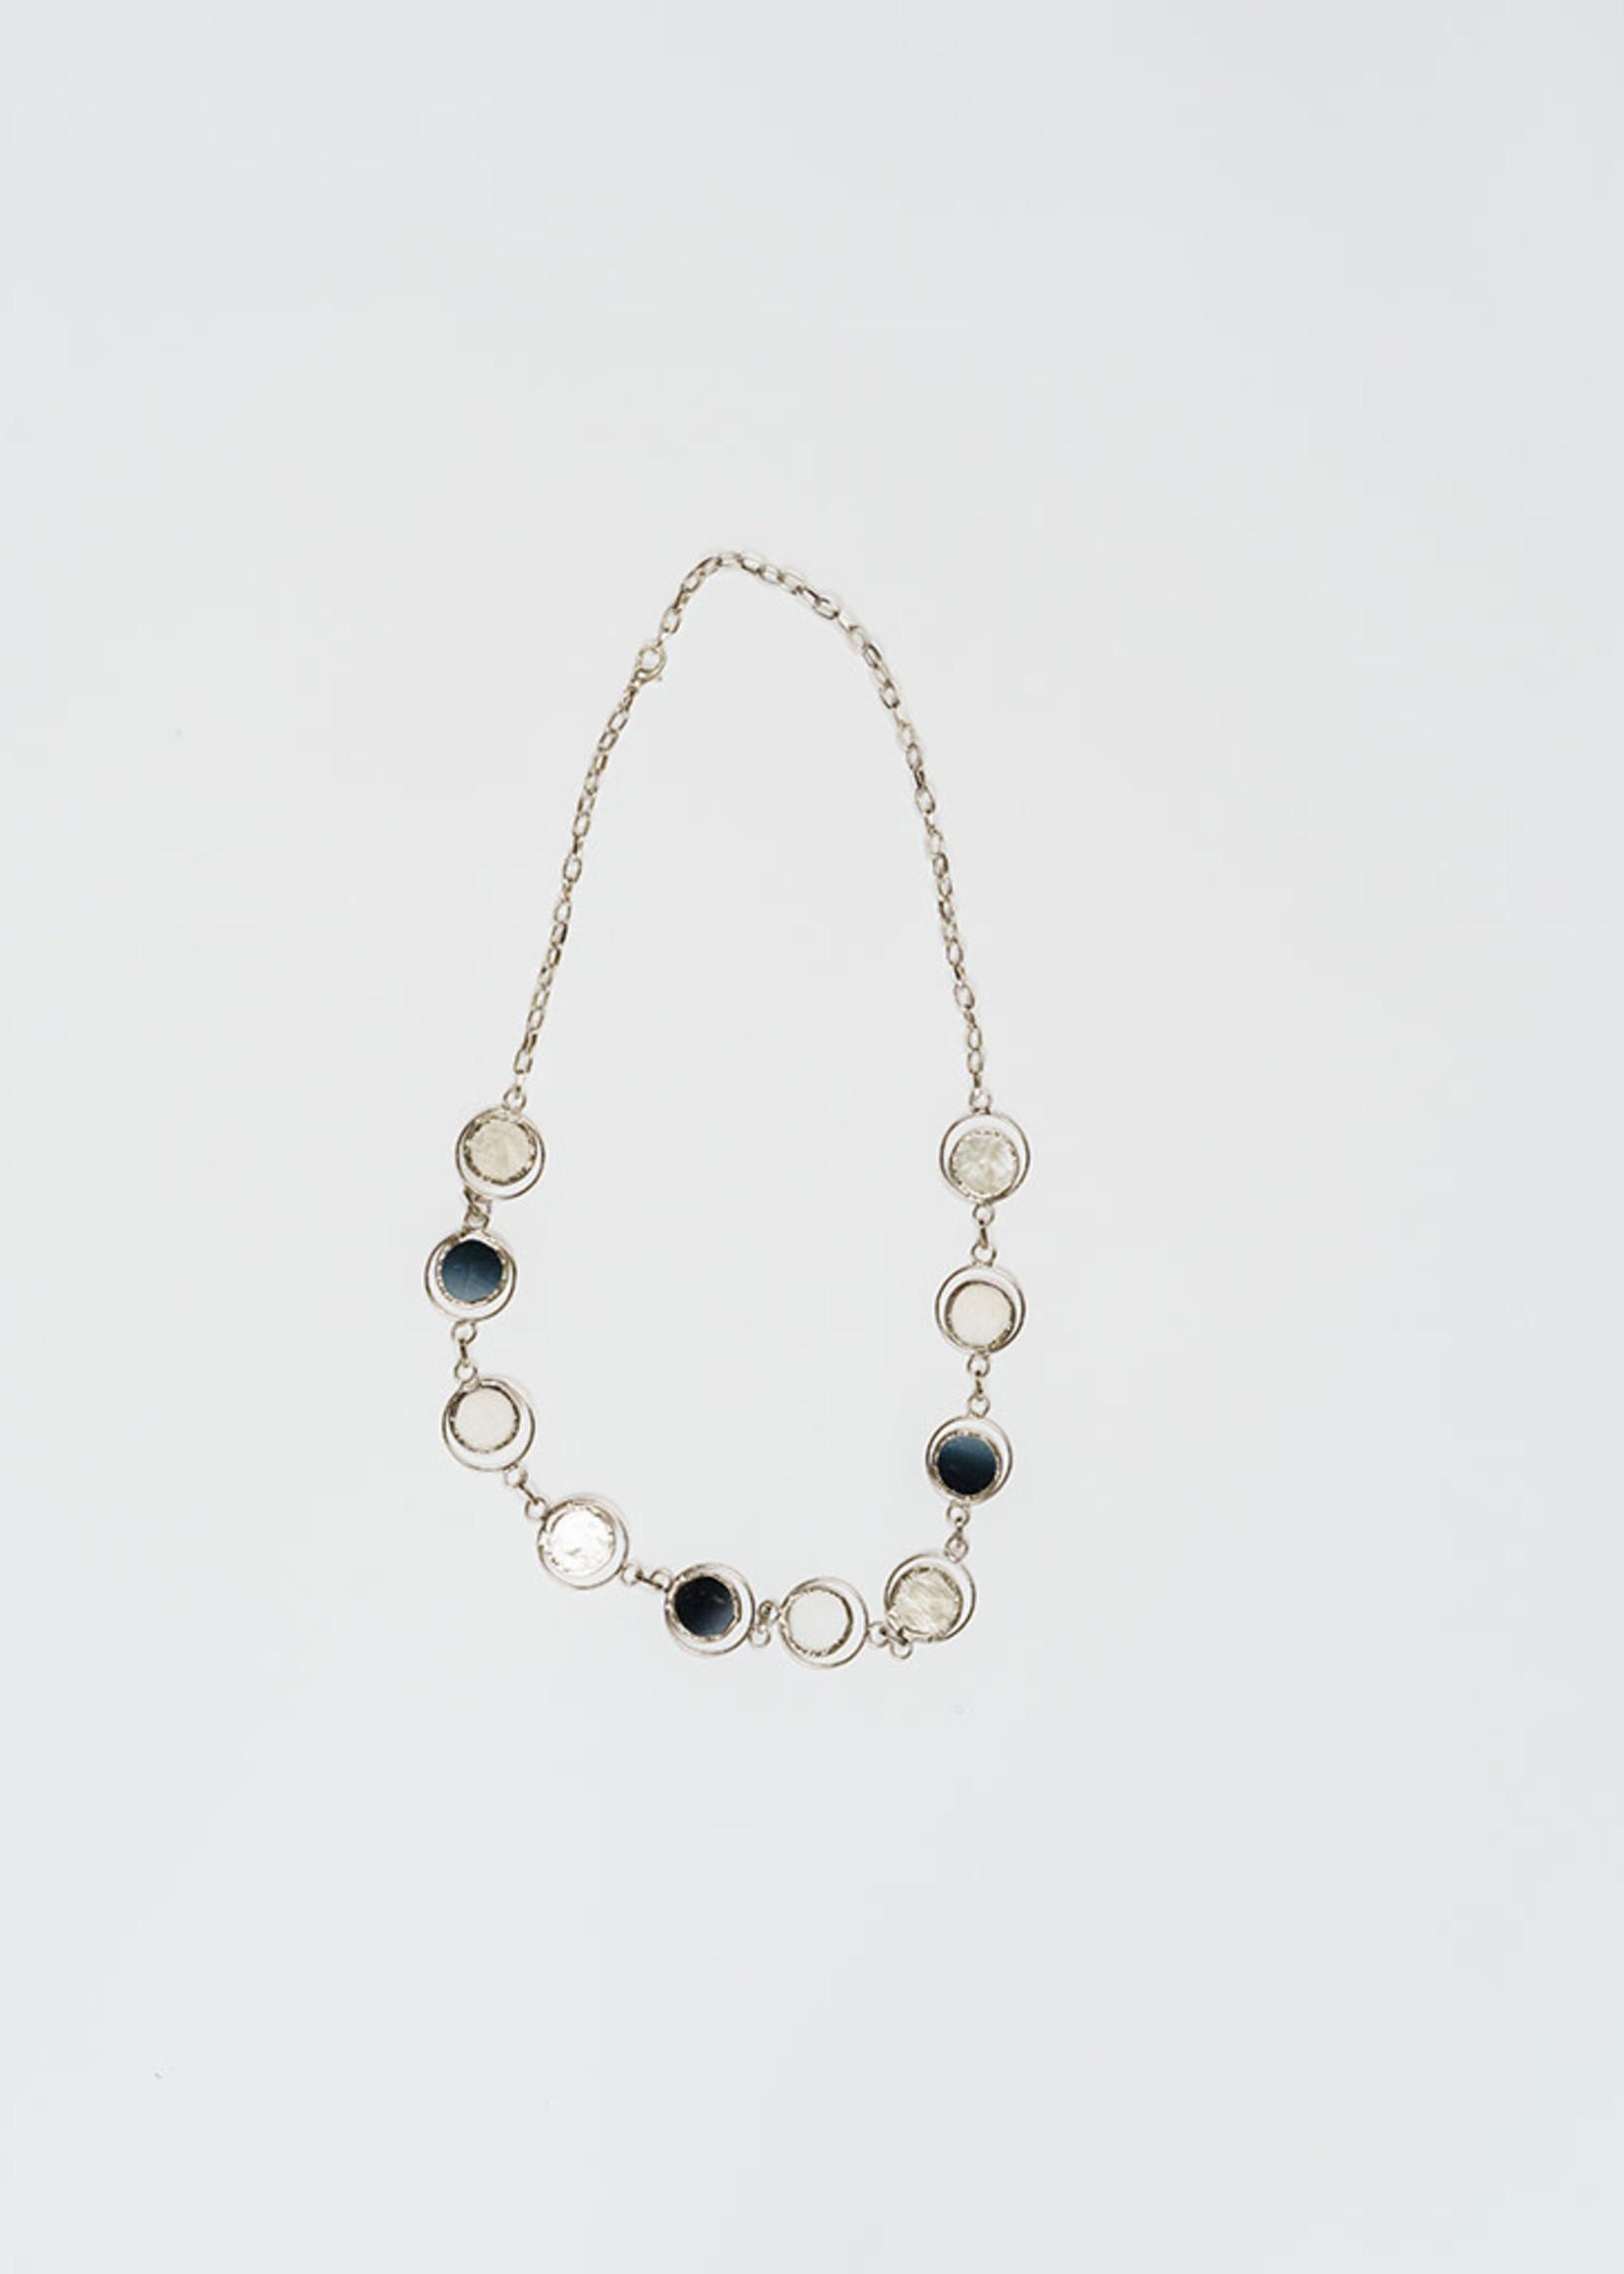 Saffy Handicrafts Moon Phase Necklace